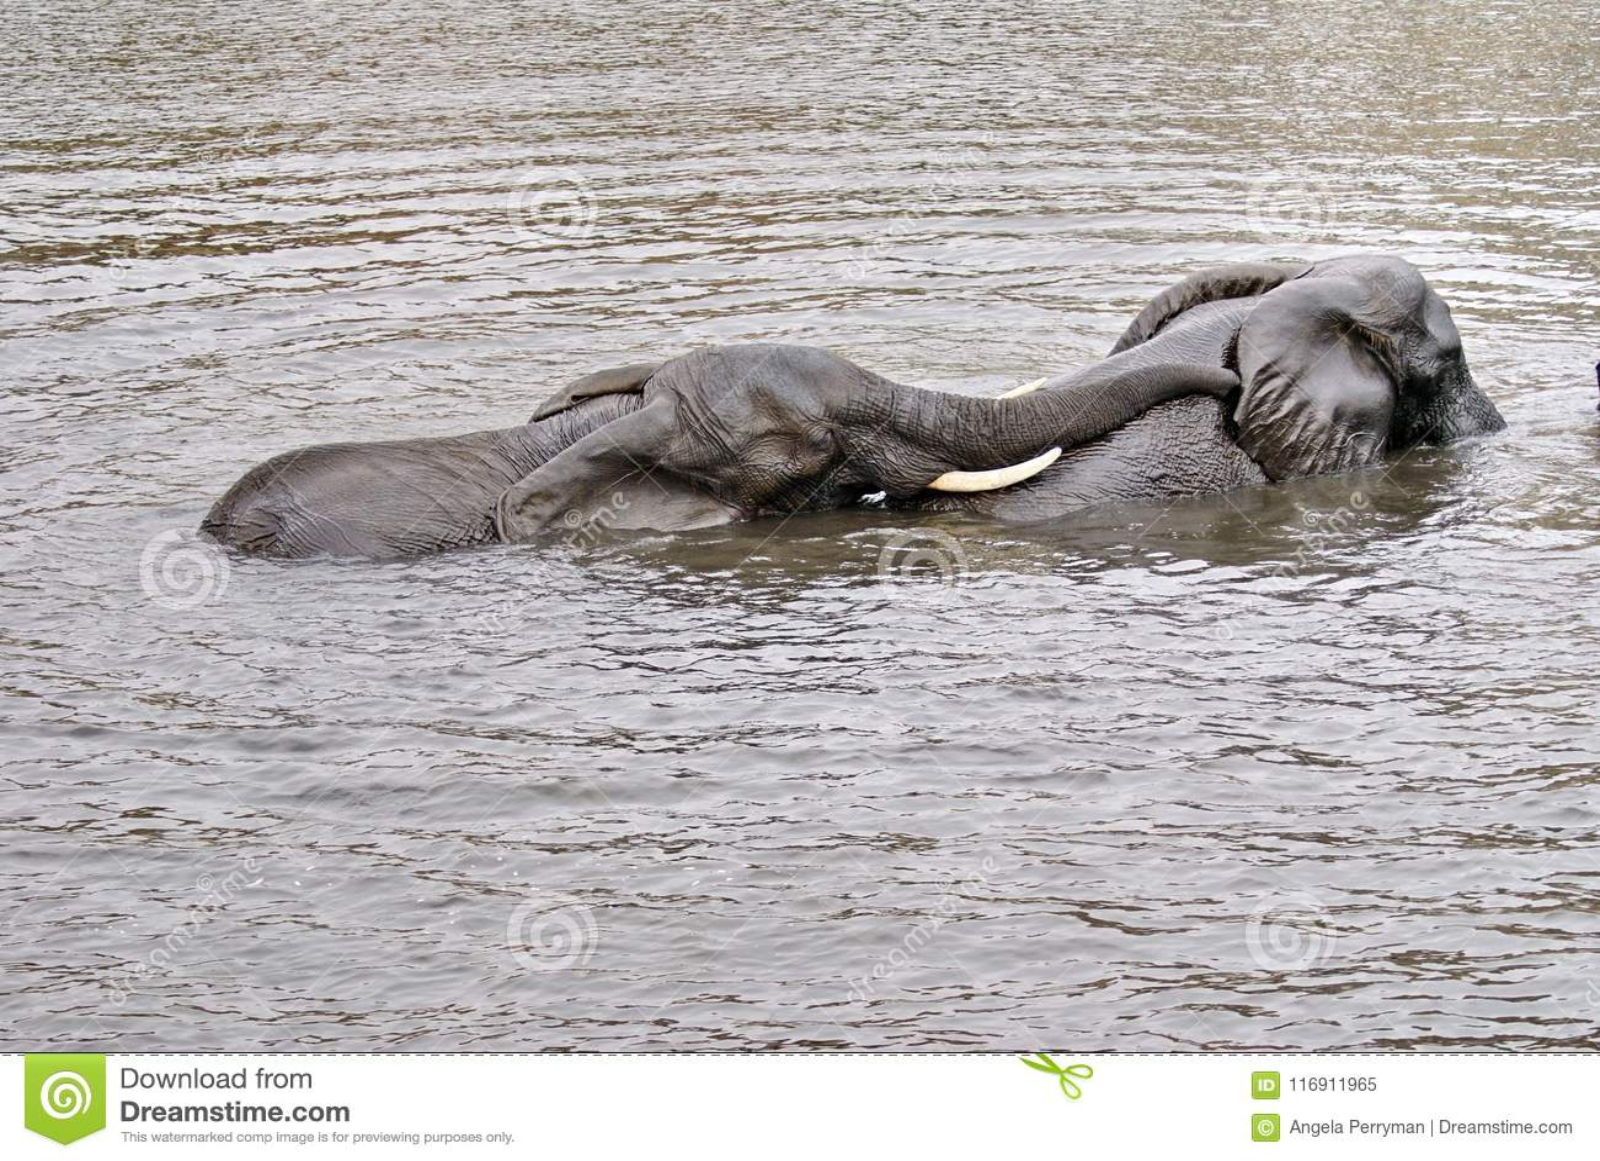 Elephants Having Sex In The River Stock Image Image Of Chobe